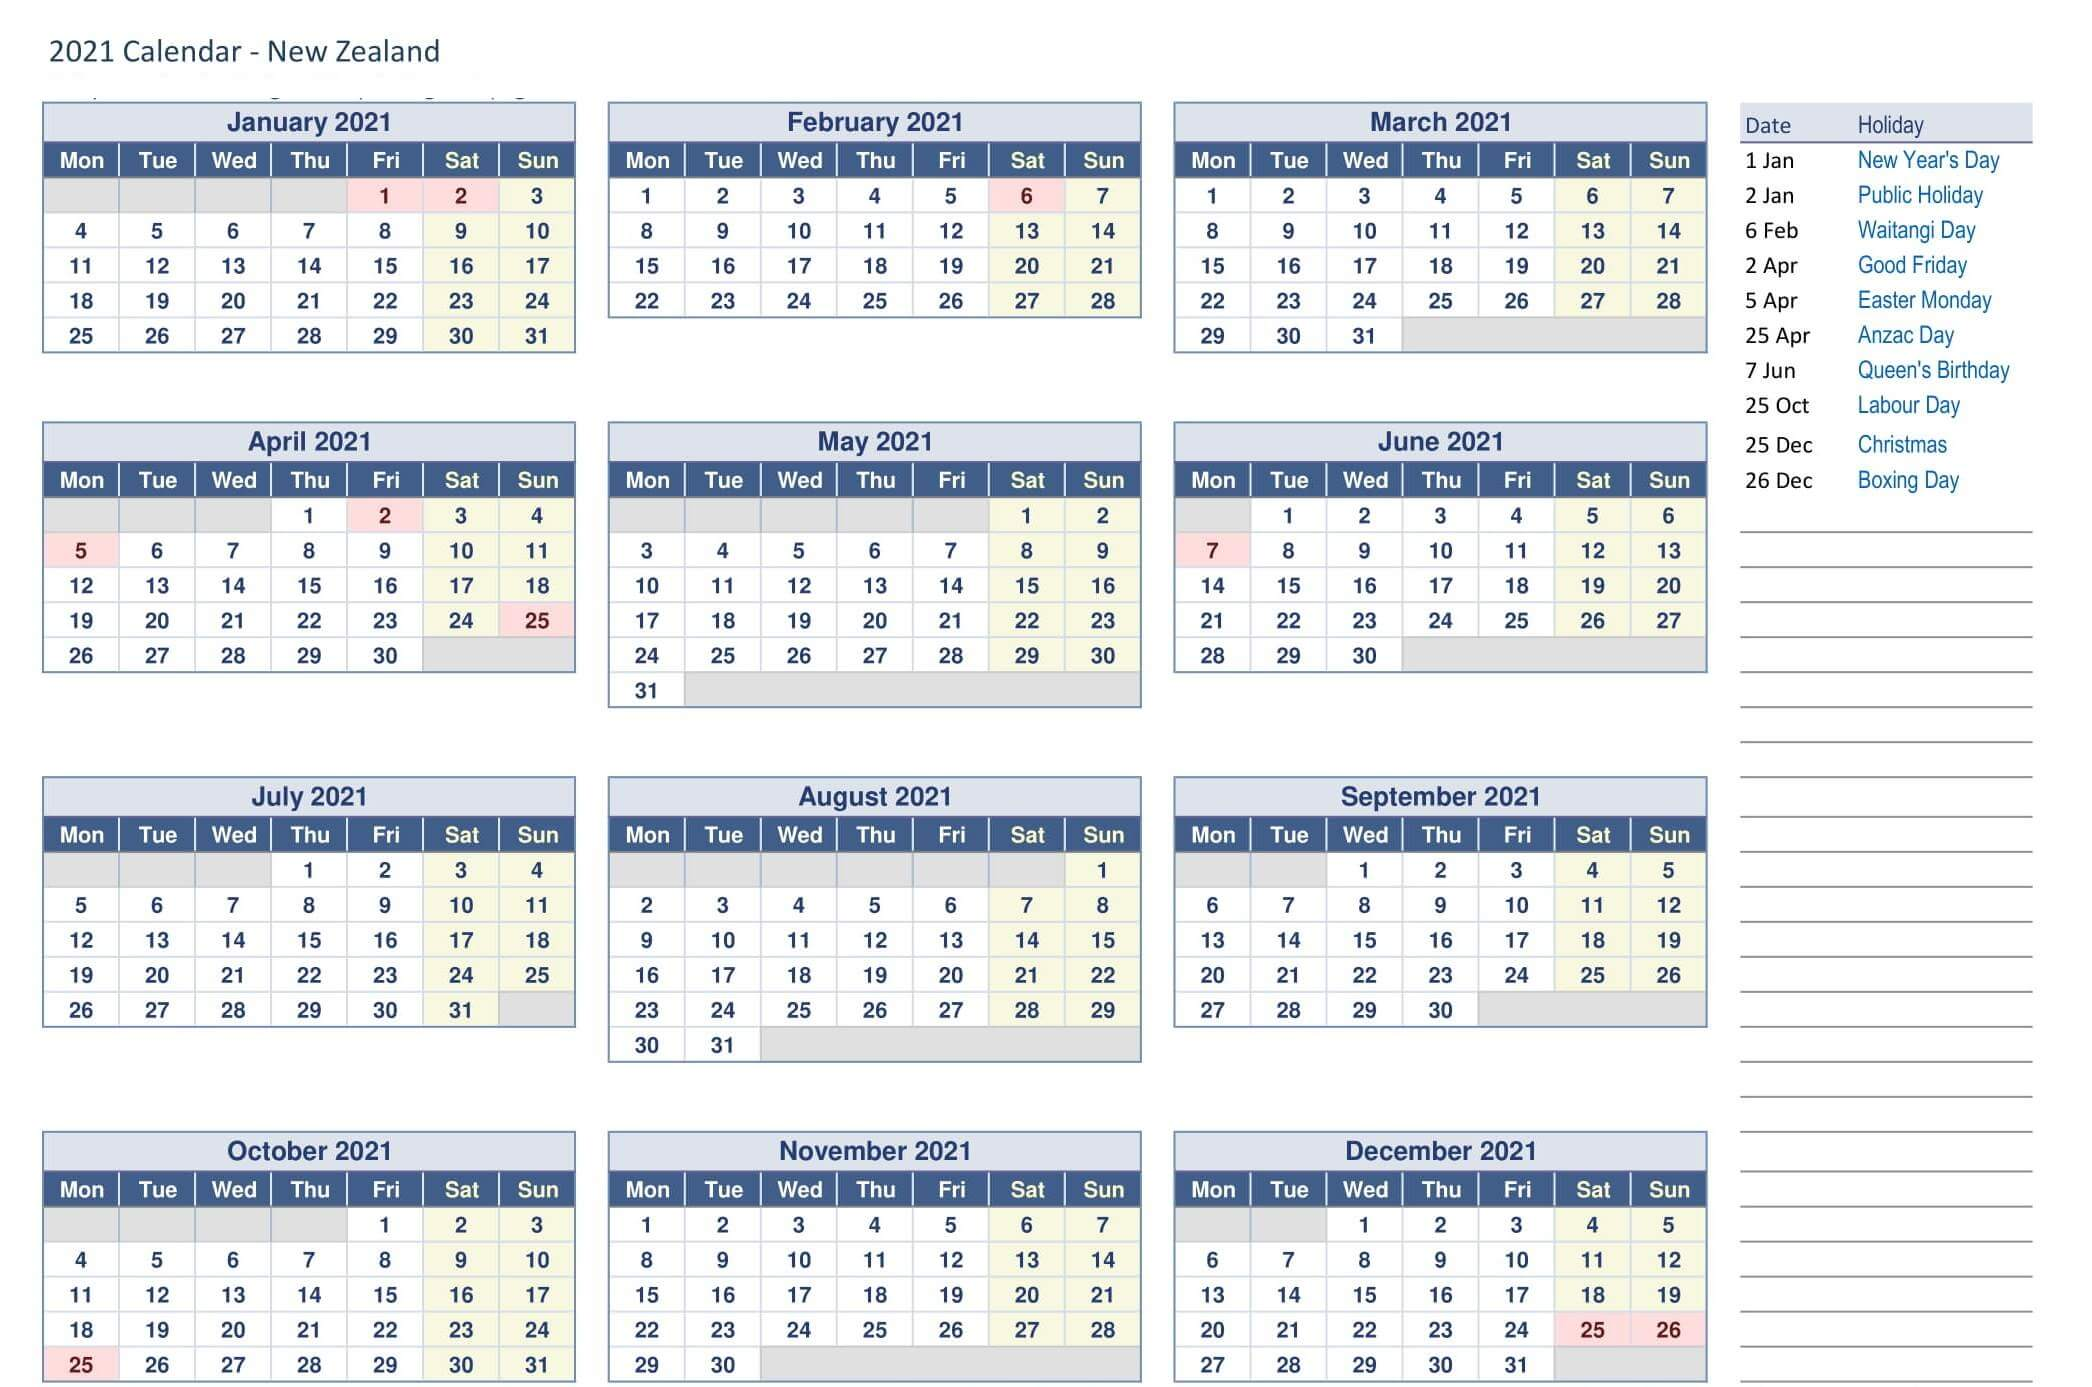 Printable Yearly Calendar 2021 NZ